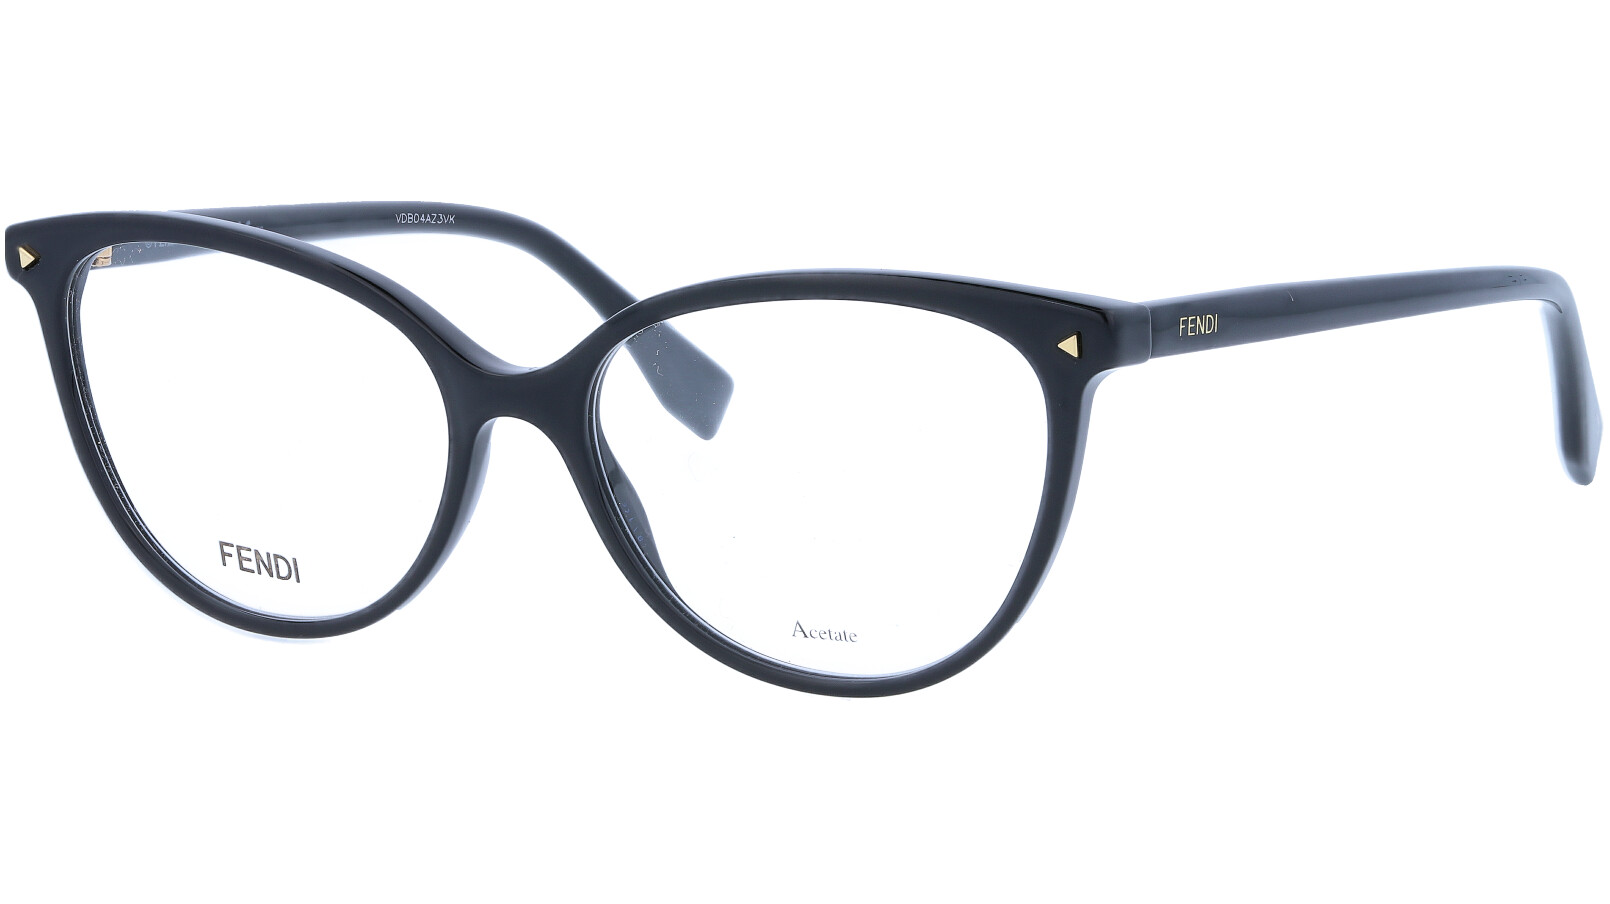 FENDI FF0351 807 53 BLACK Glasses